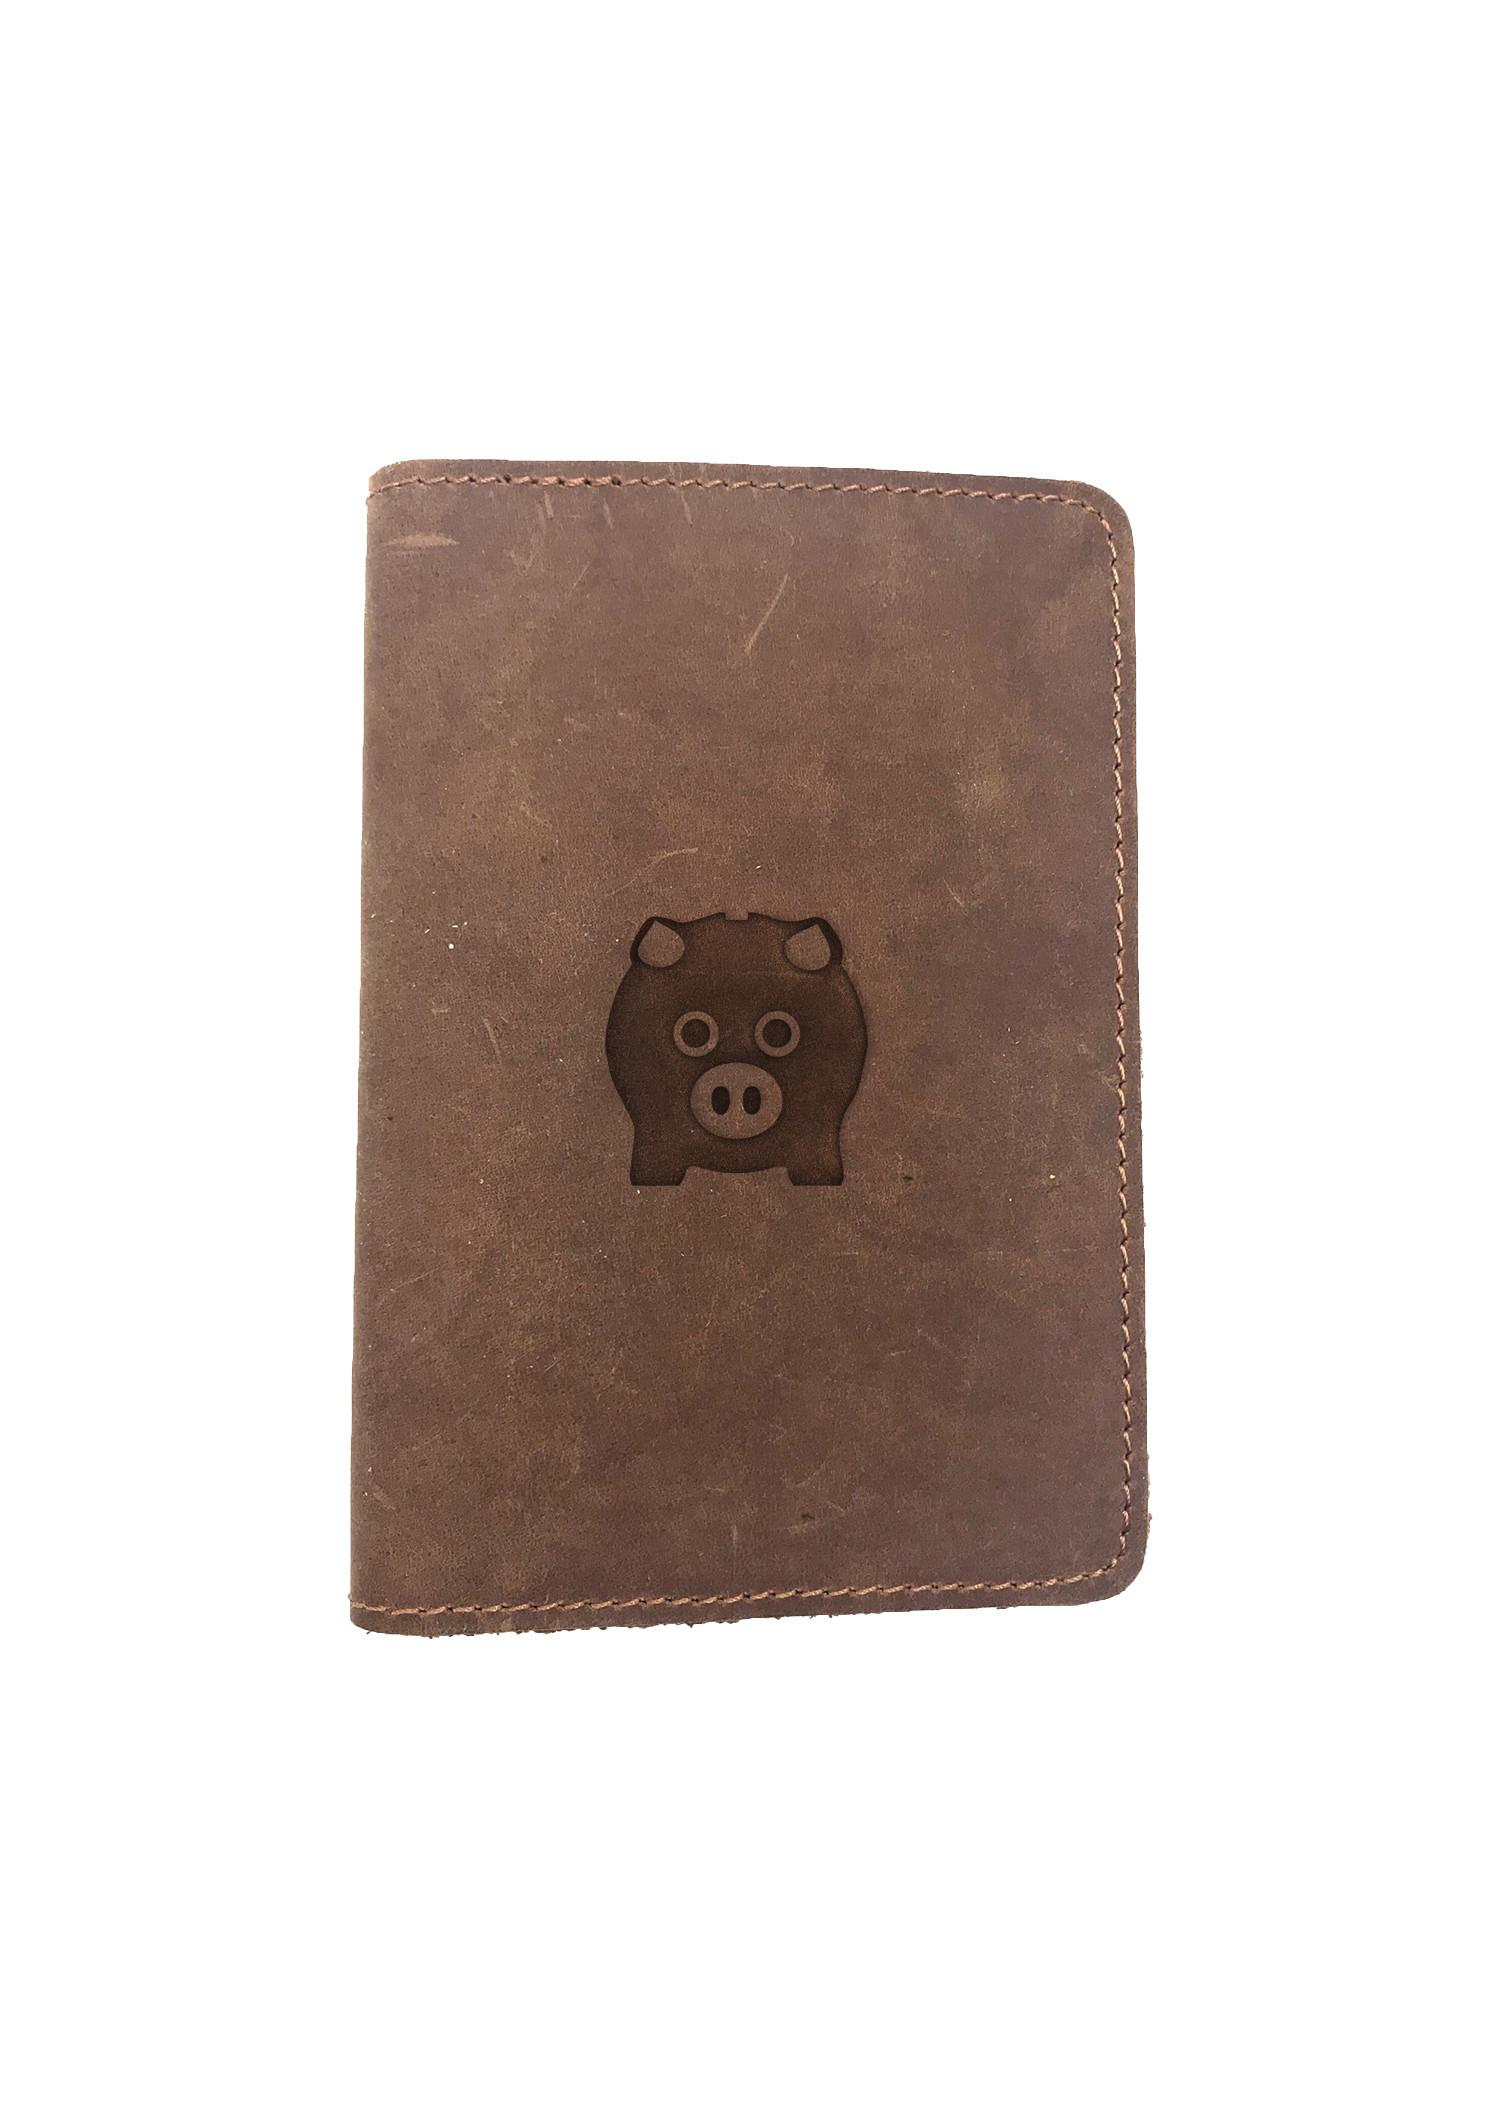 Passport Cover Bao Da Hộ Chiếu Da Sáp Khắc Hình Heo PIGGY BANK FACE (BROWN)